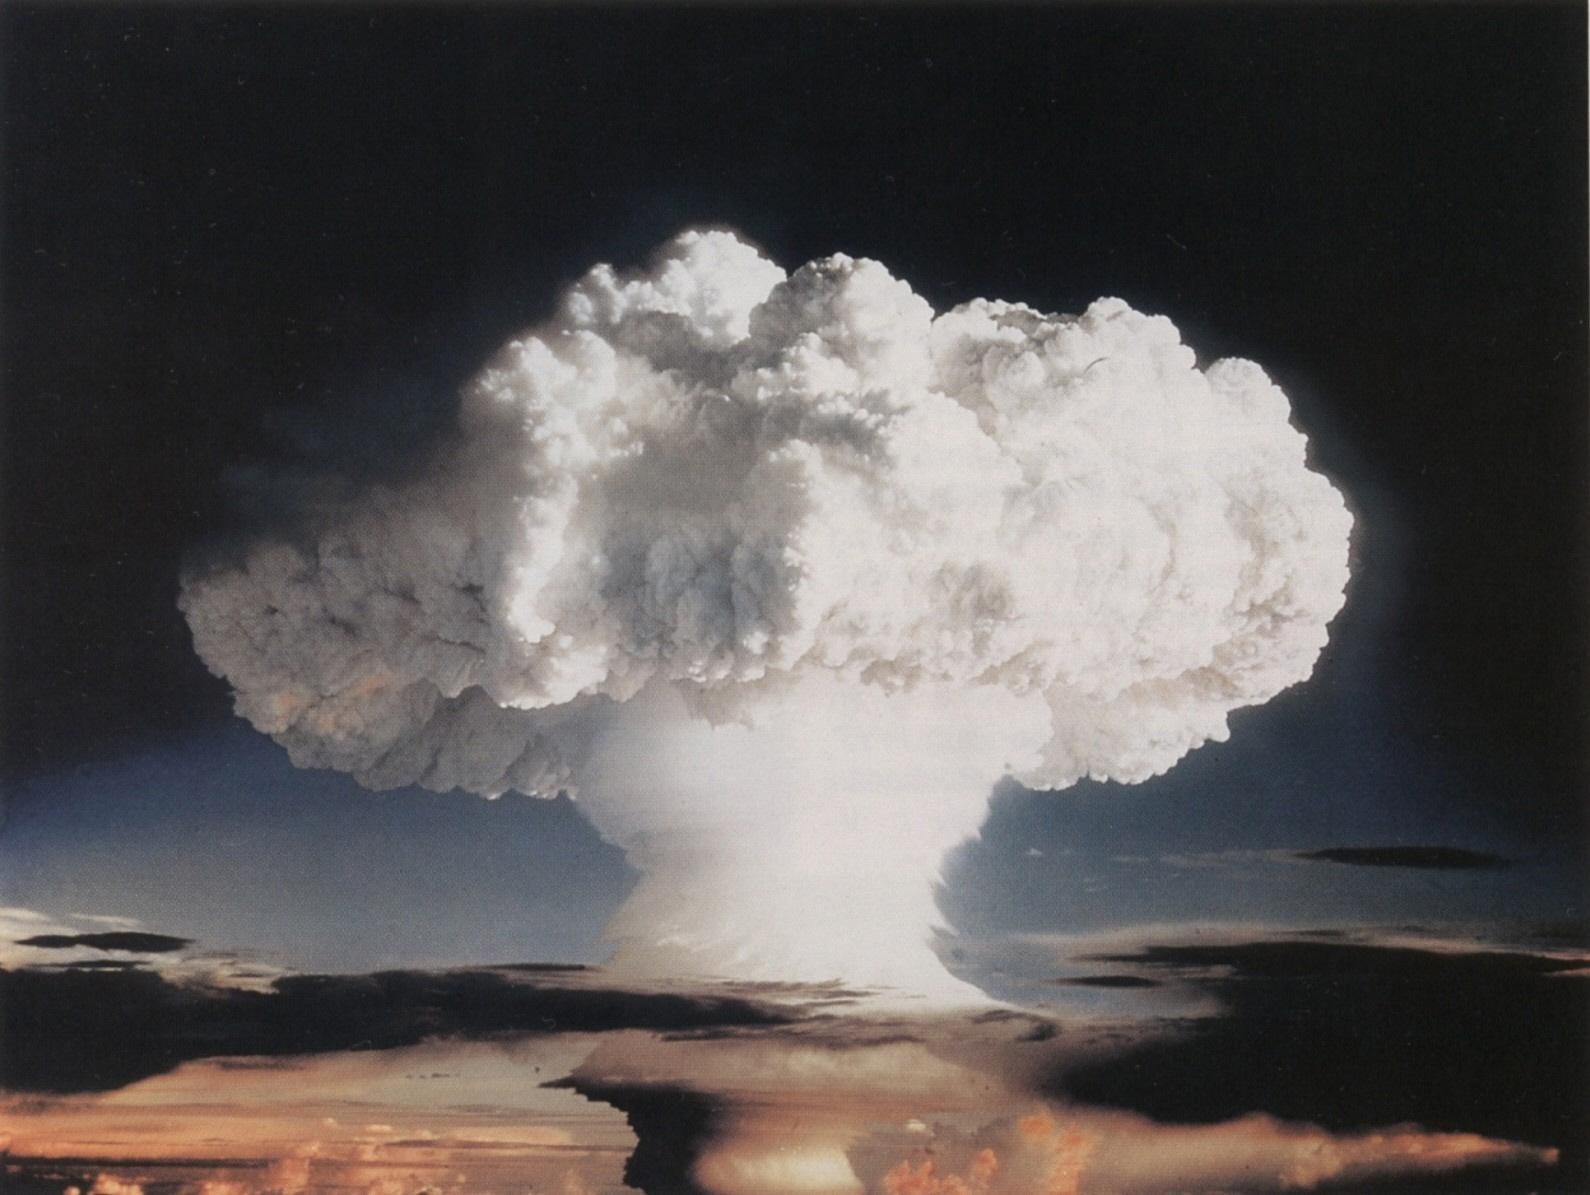 ivy-mike-hydrogen-bomb-mushroom-cloud